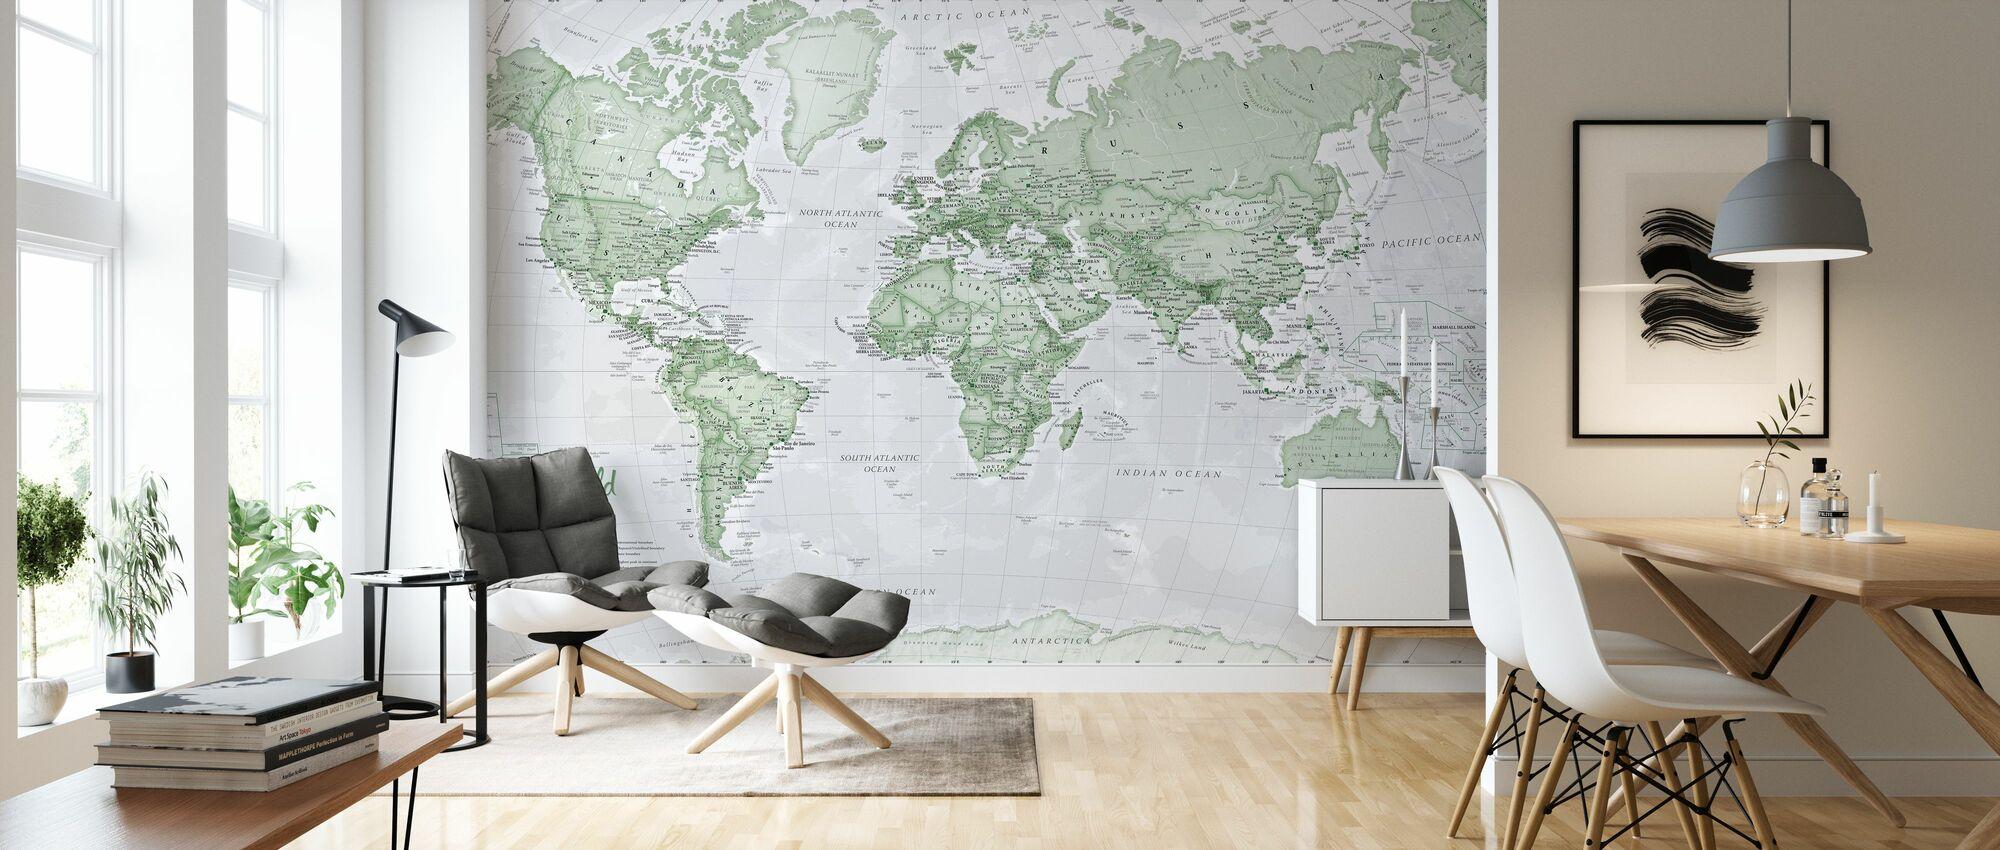 World Map Political Green - Wallpaper - Living Room